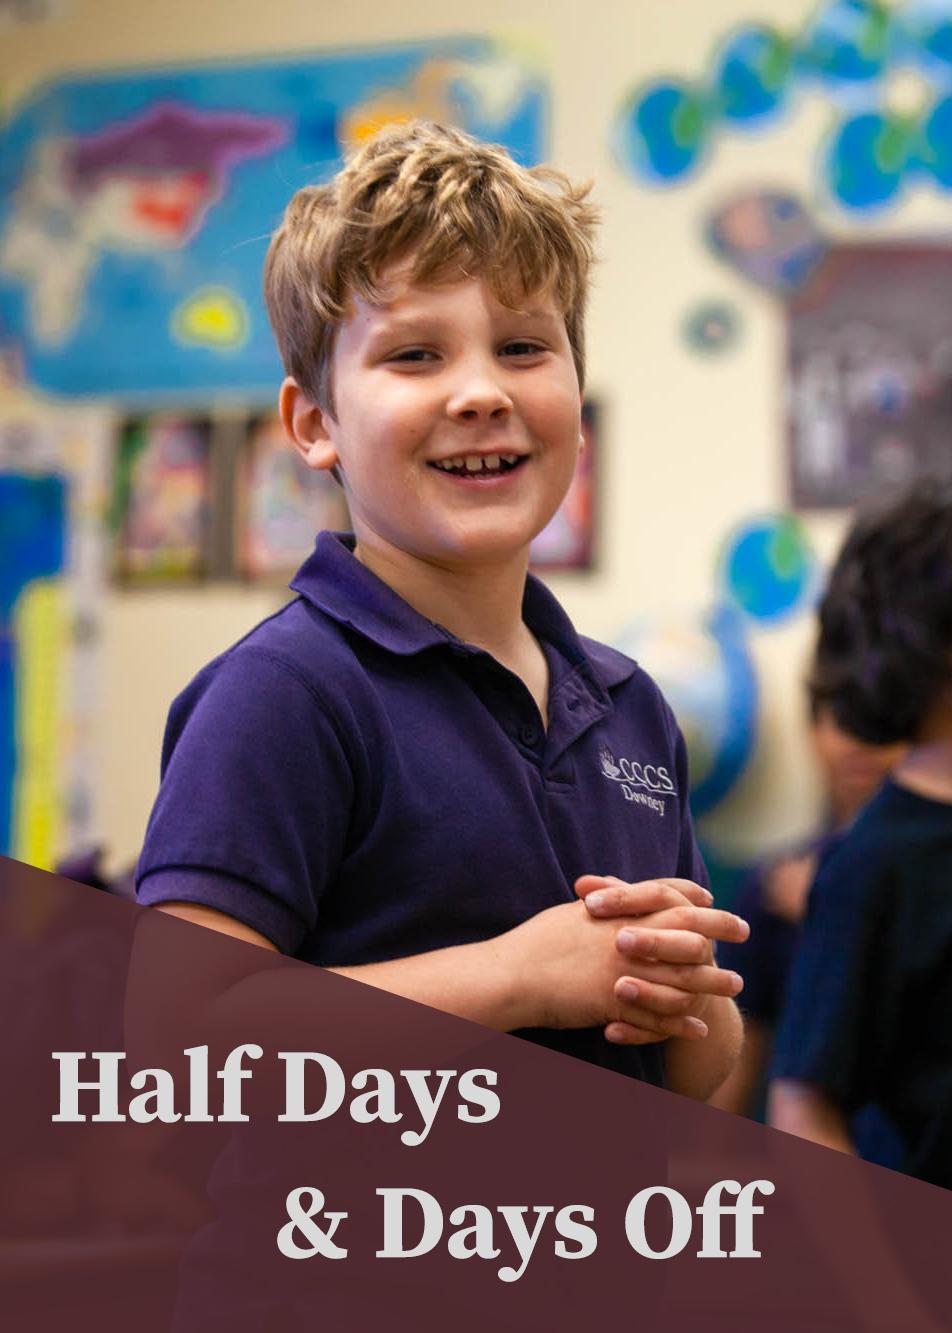 Half Days & Days Off